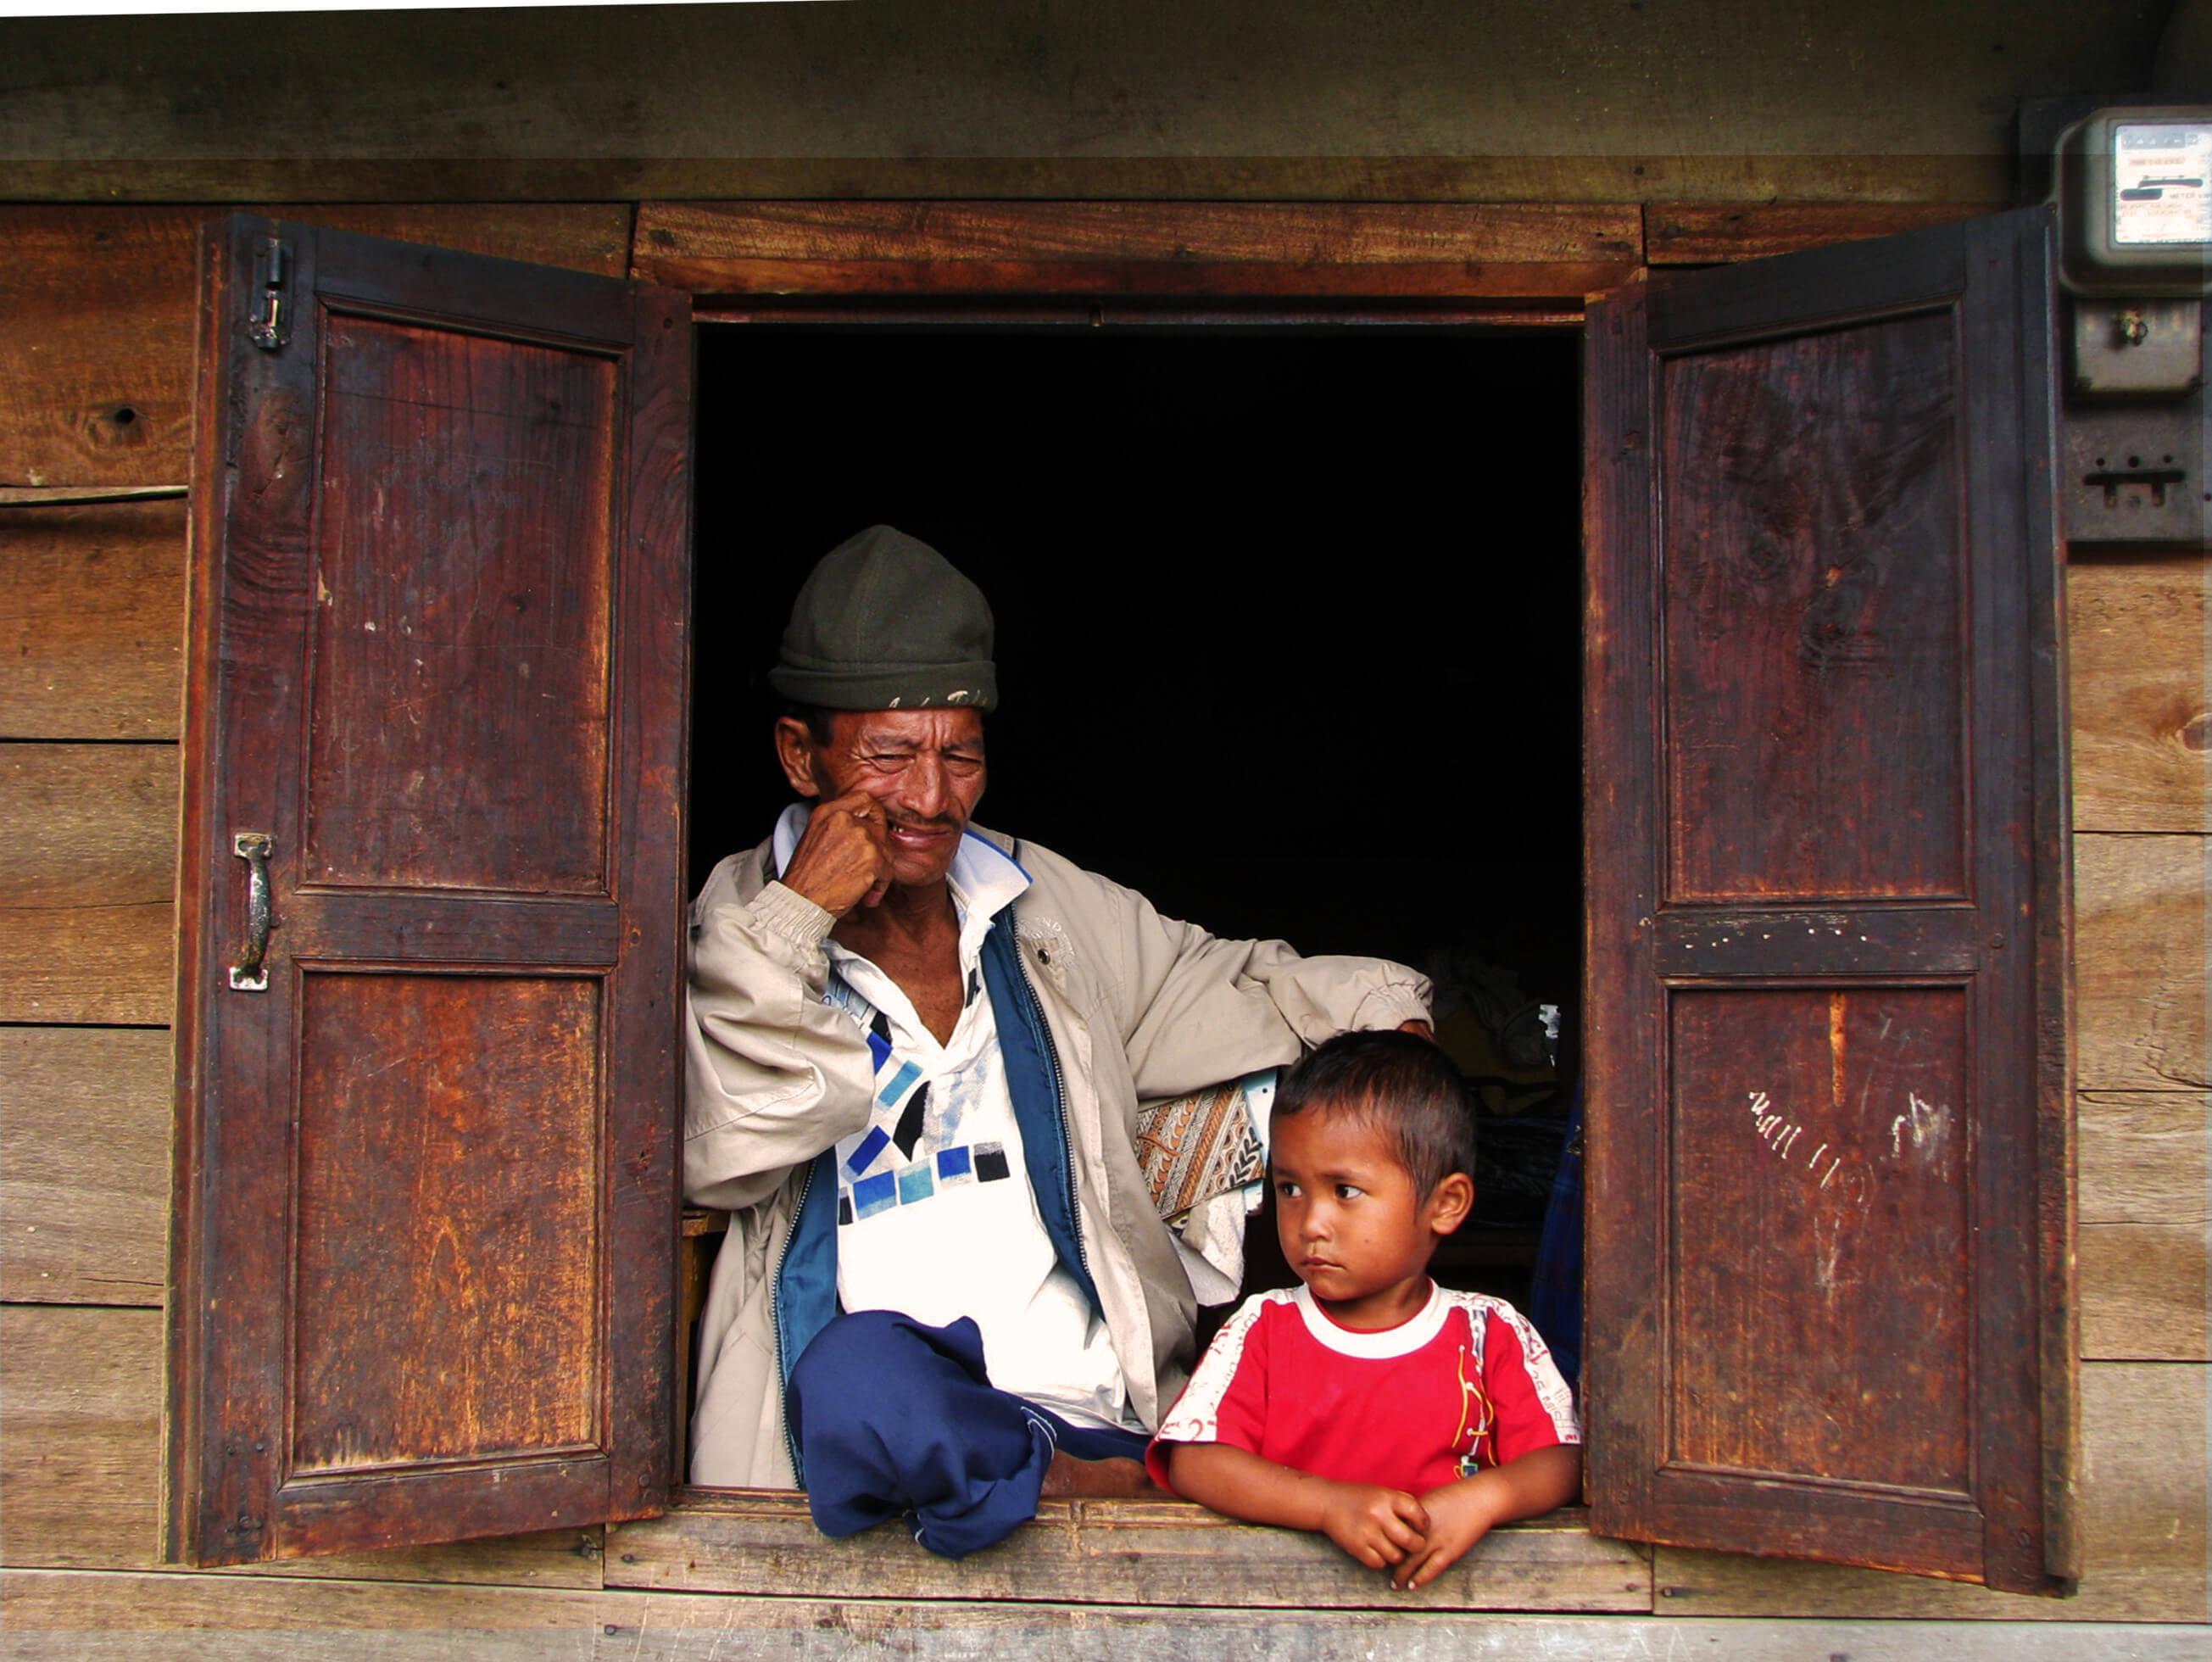 https://bubo.sk/uploads/galleries/7542/jozefharvanek_indonezia_sumatra-toba-batak-v-batackej-dedine-na-samosire.jpg